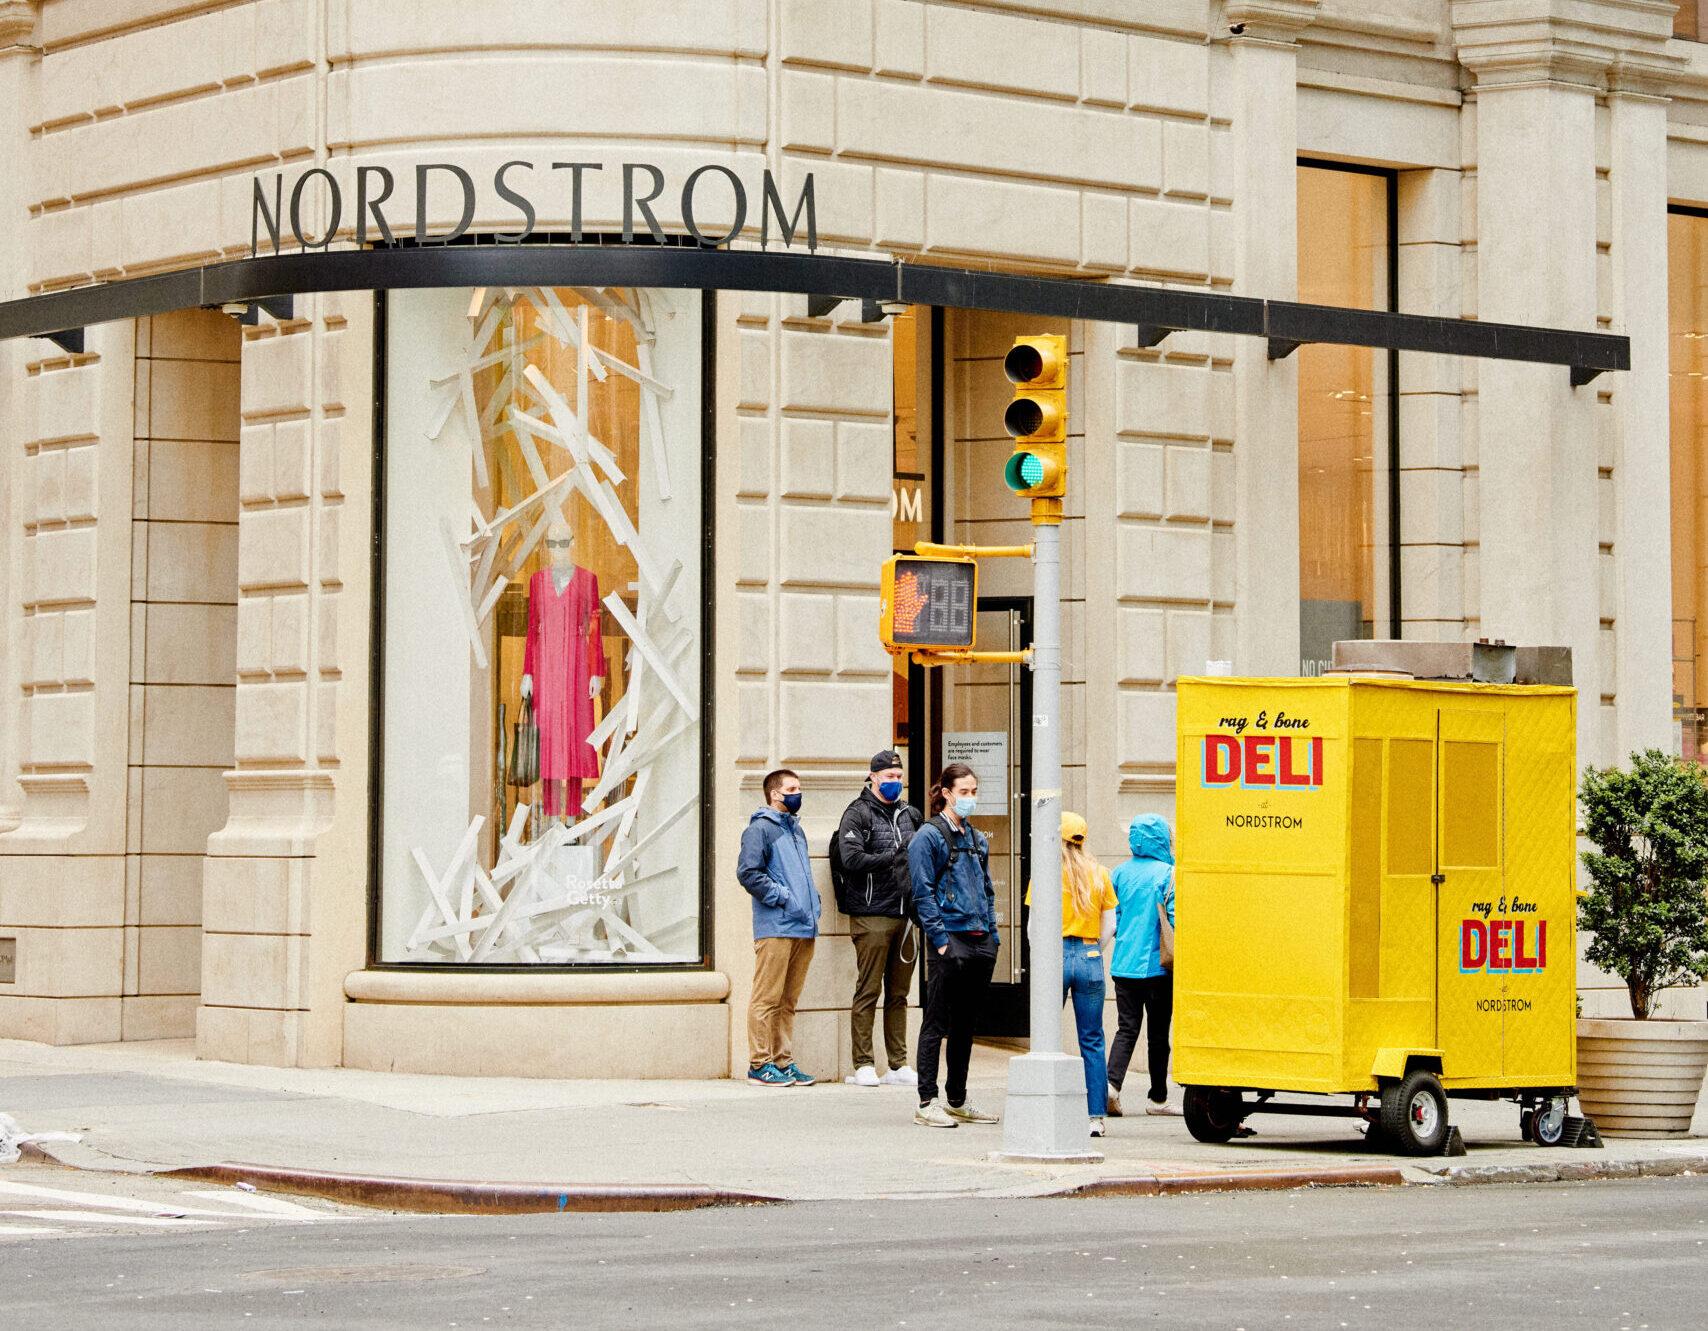 Nordstrom Rag & Bone Deli Pop Up Experiential Marketing Activation